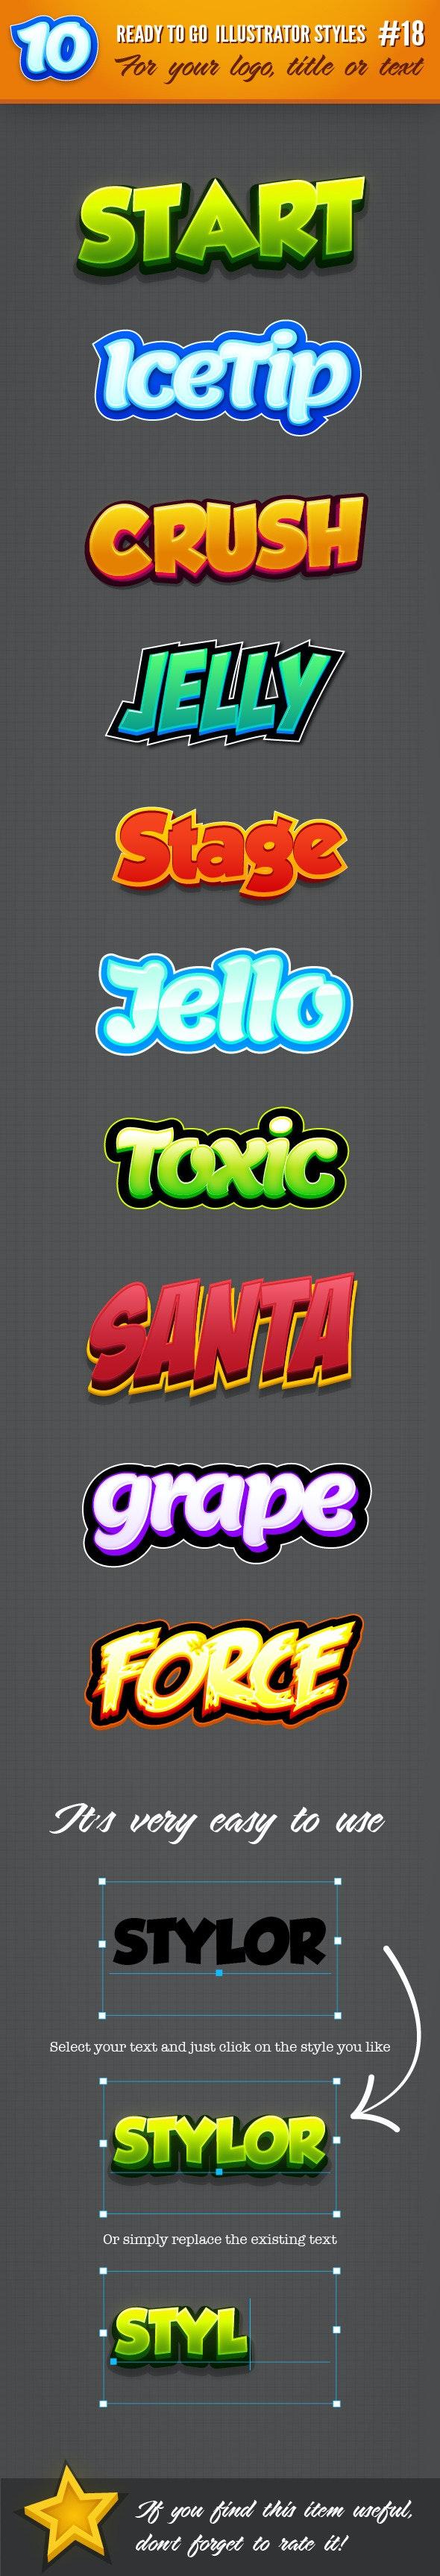 10 Logo Graphic Styles #18 - Styles Illustrator